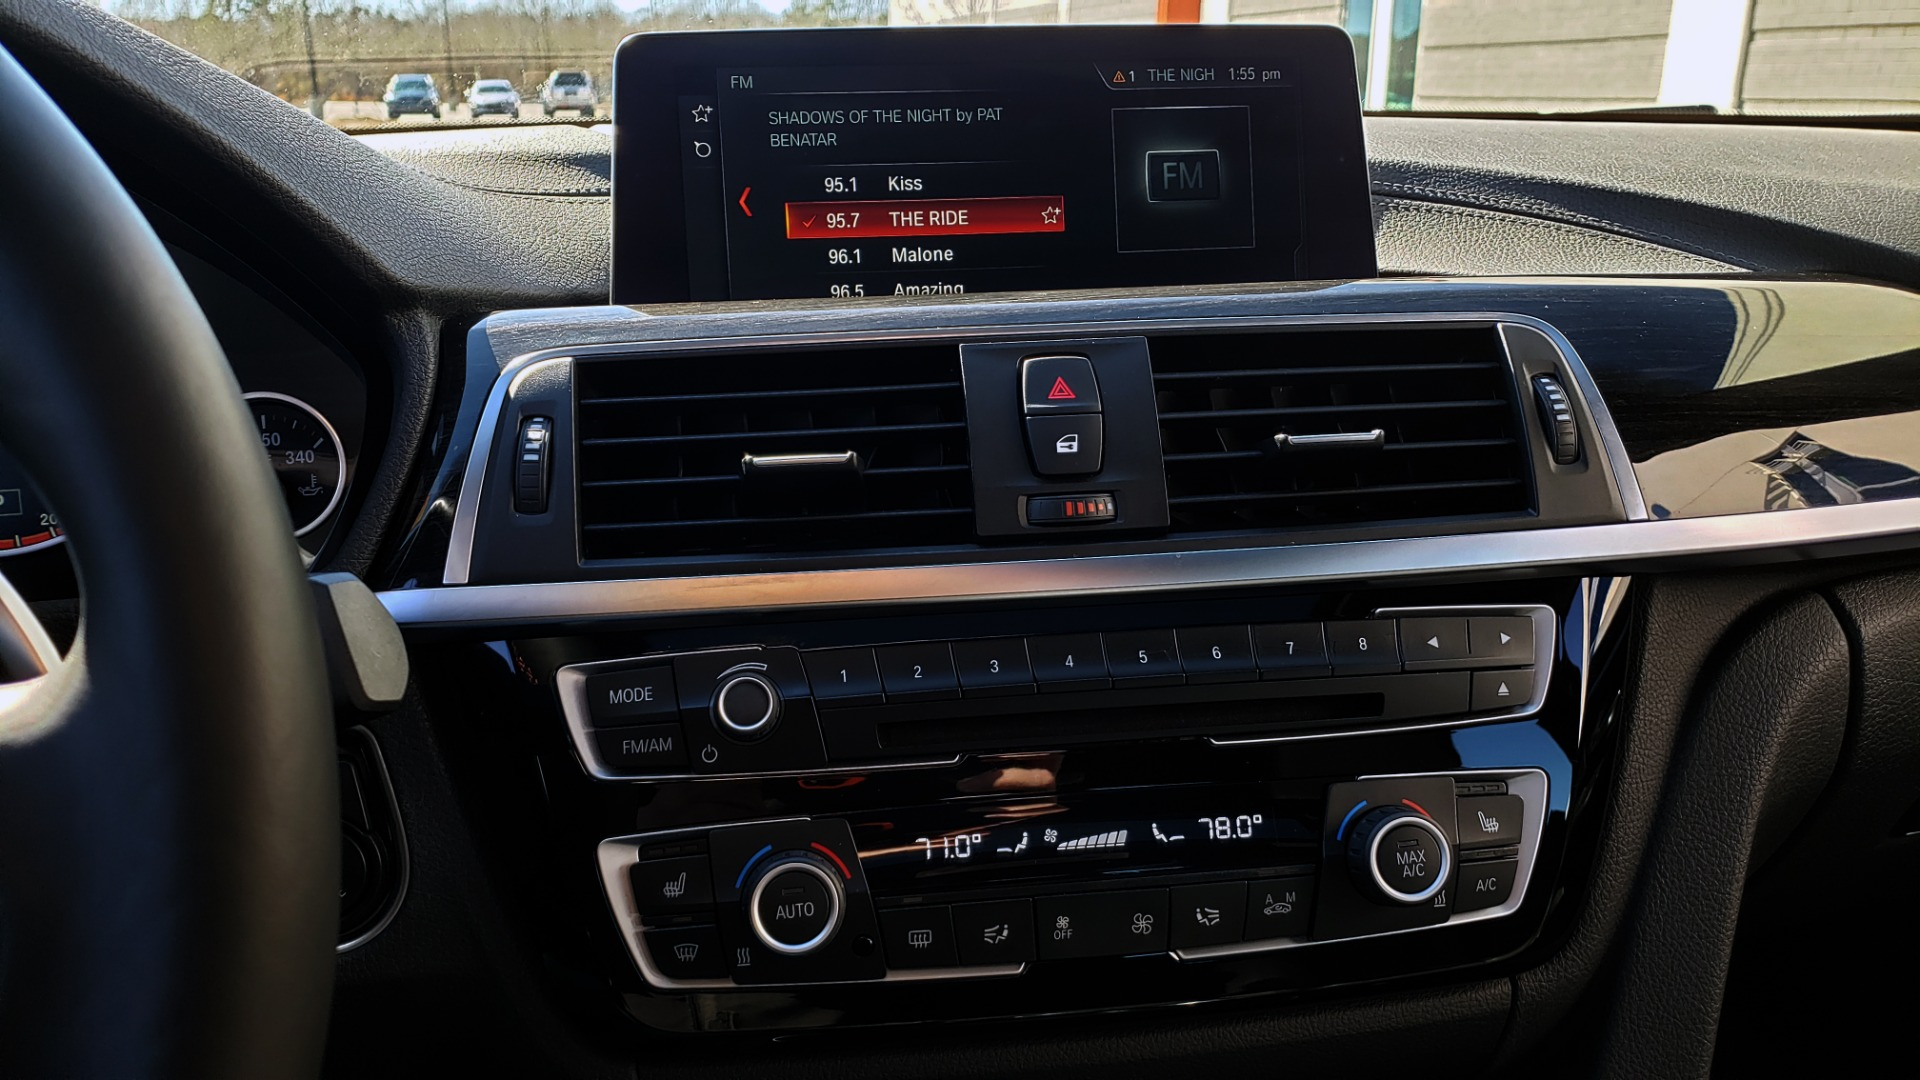 Used 2018 BMW 4 SERIES 430IXDRIVE / PREMIUM / NAV / SUNROOF / ESSENTIALS PKG for sale $27,795 at Formula Imports in Charlotte NC 28227 44